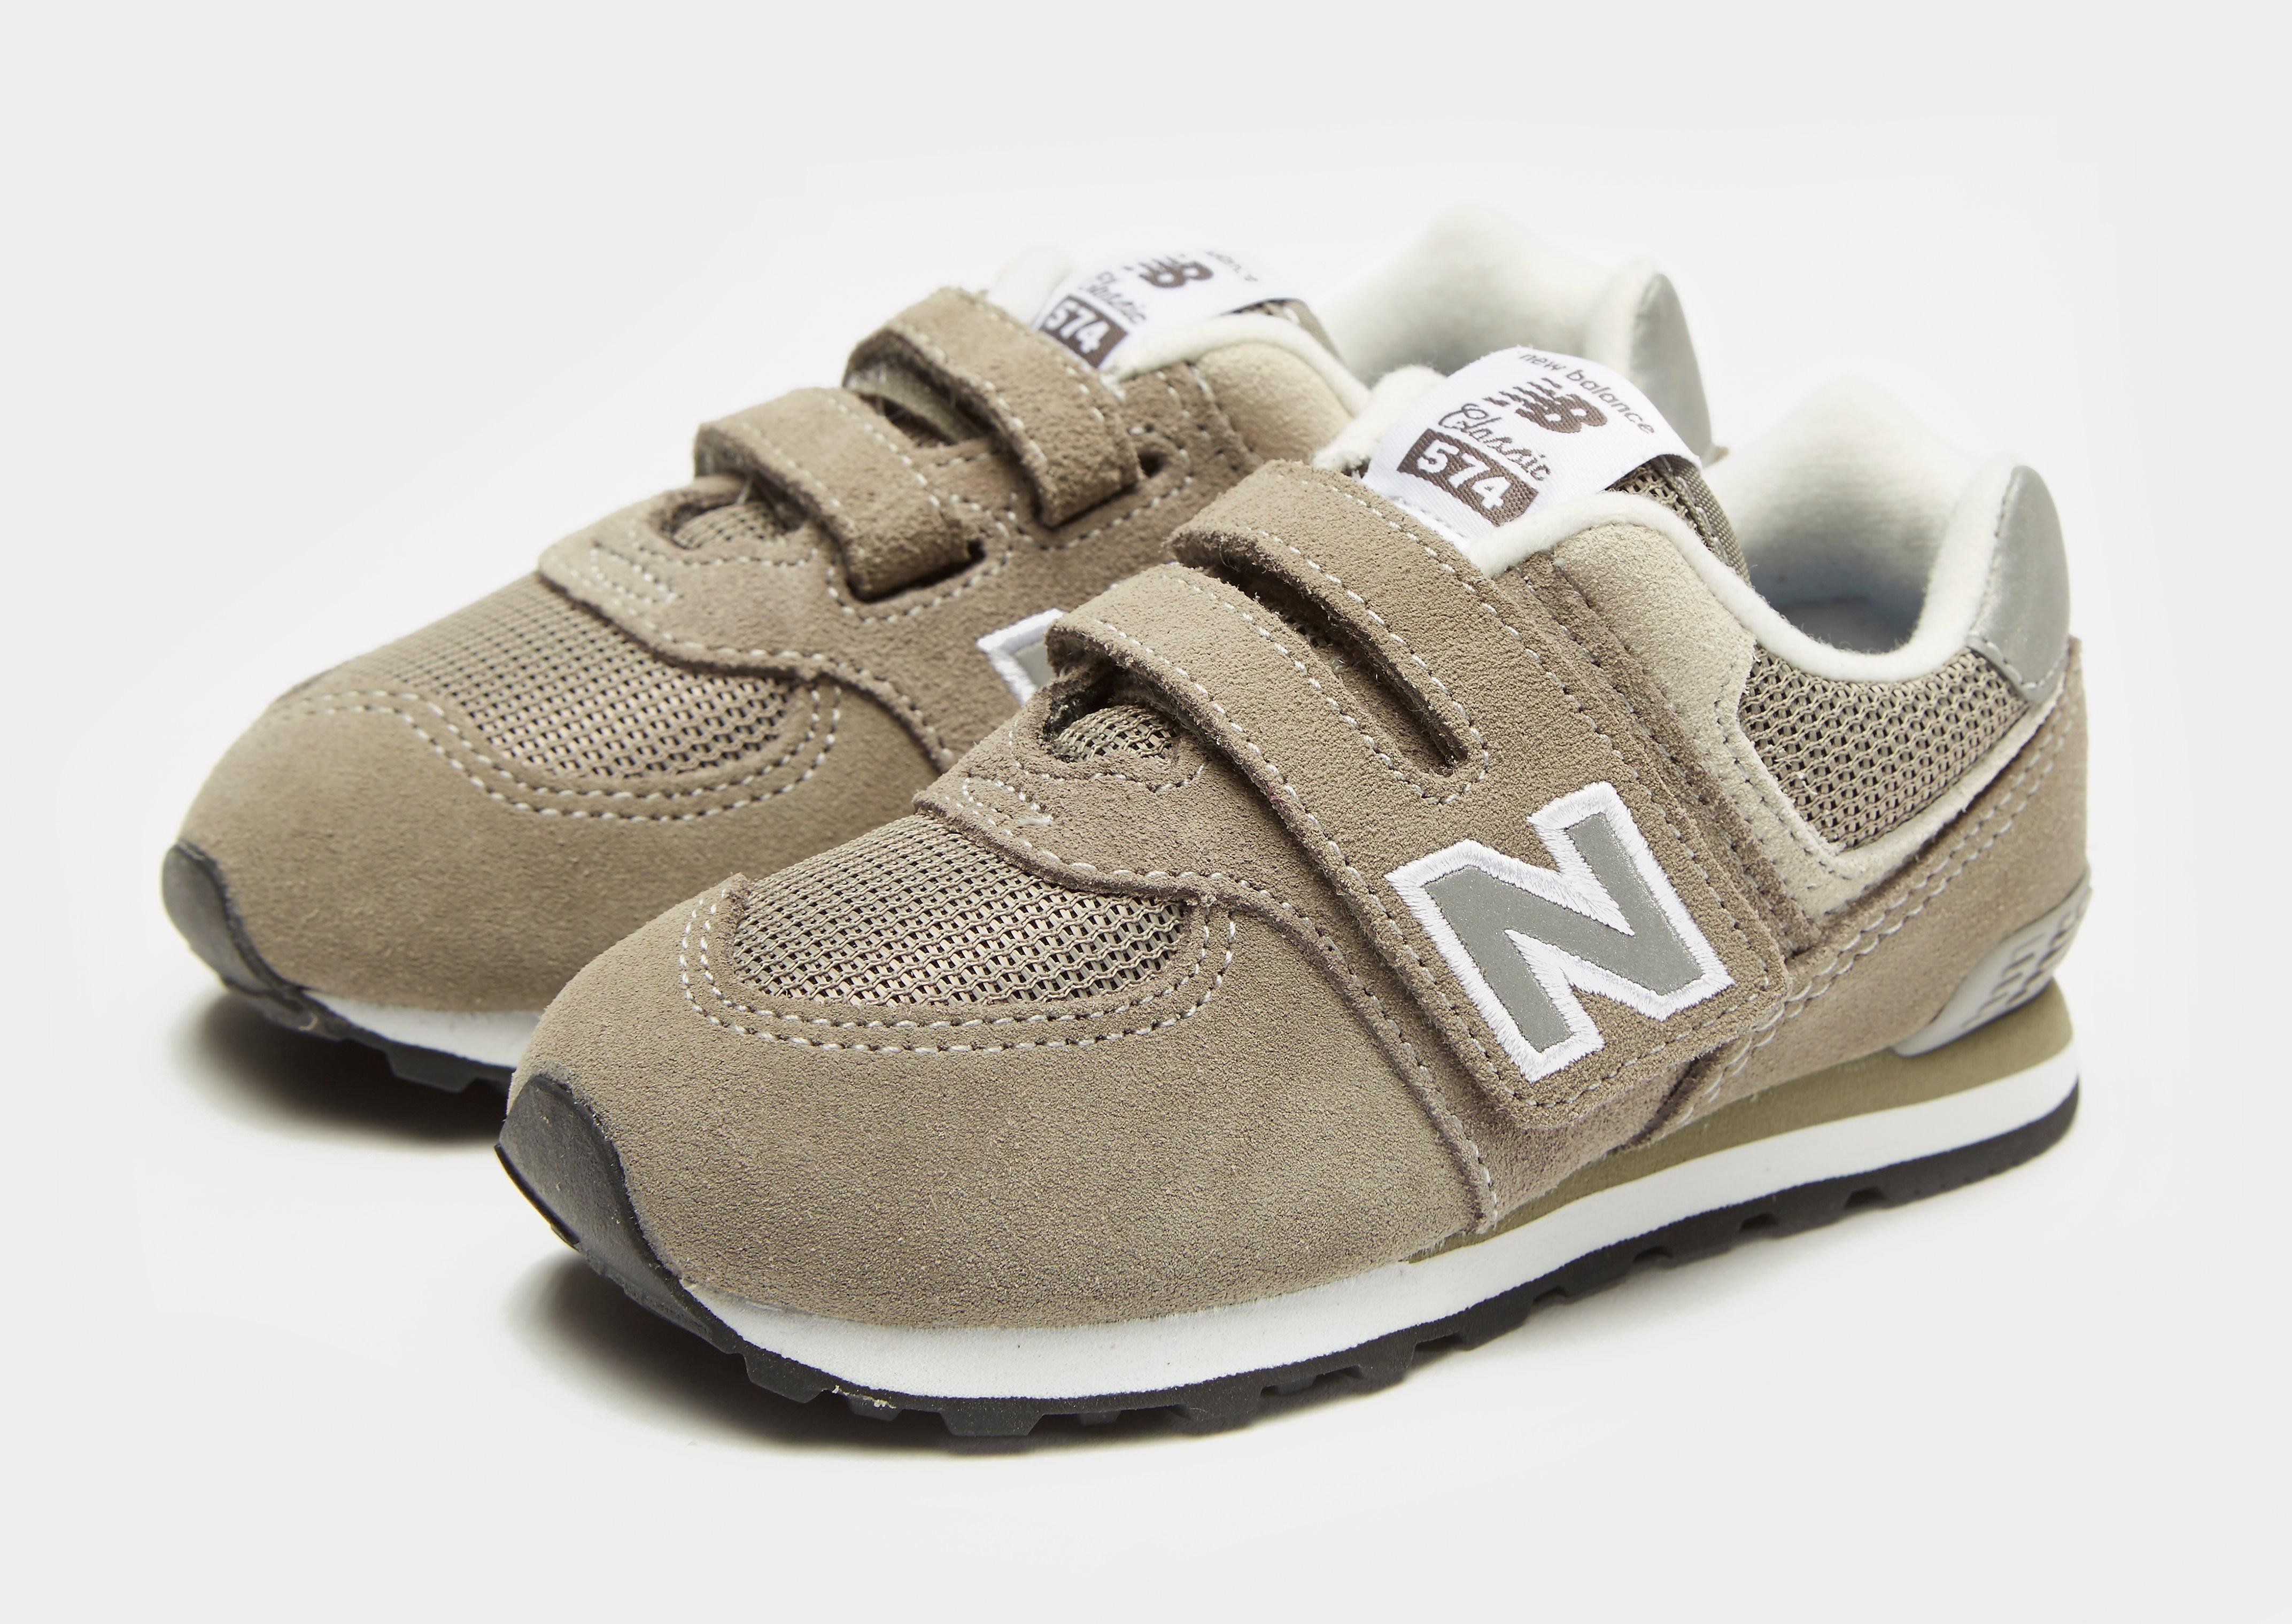 New Balance 574 Infant